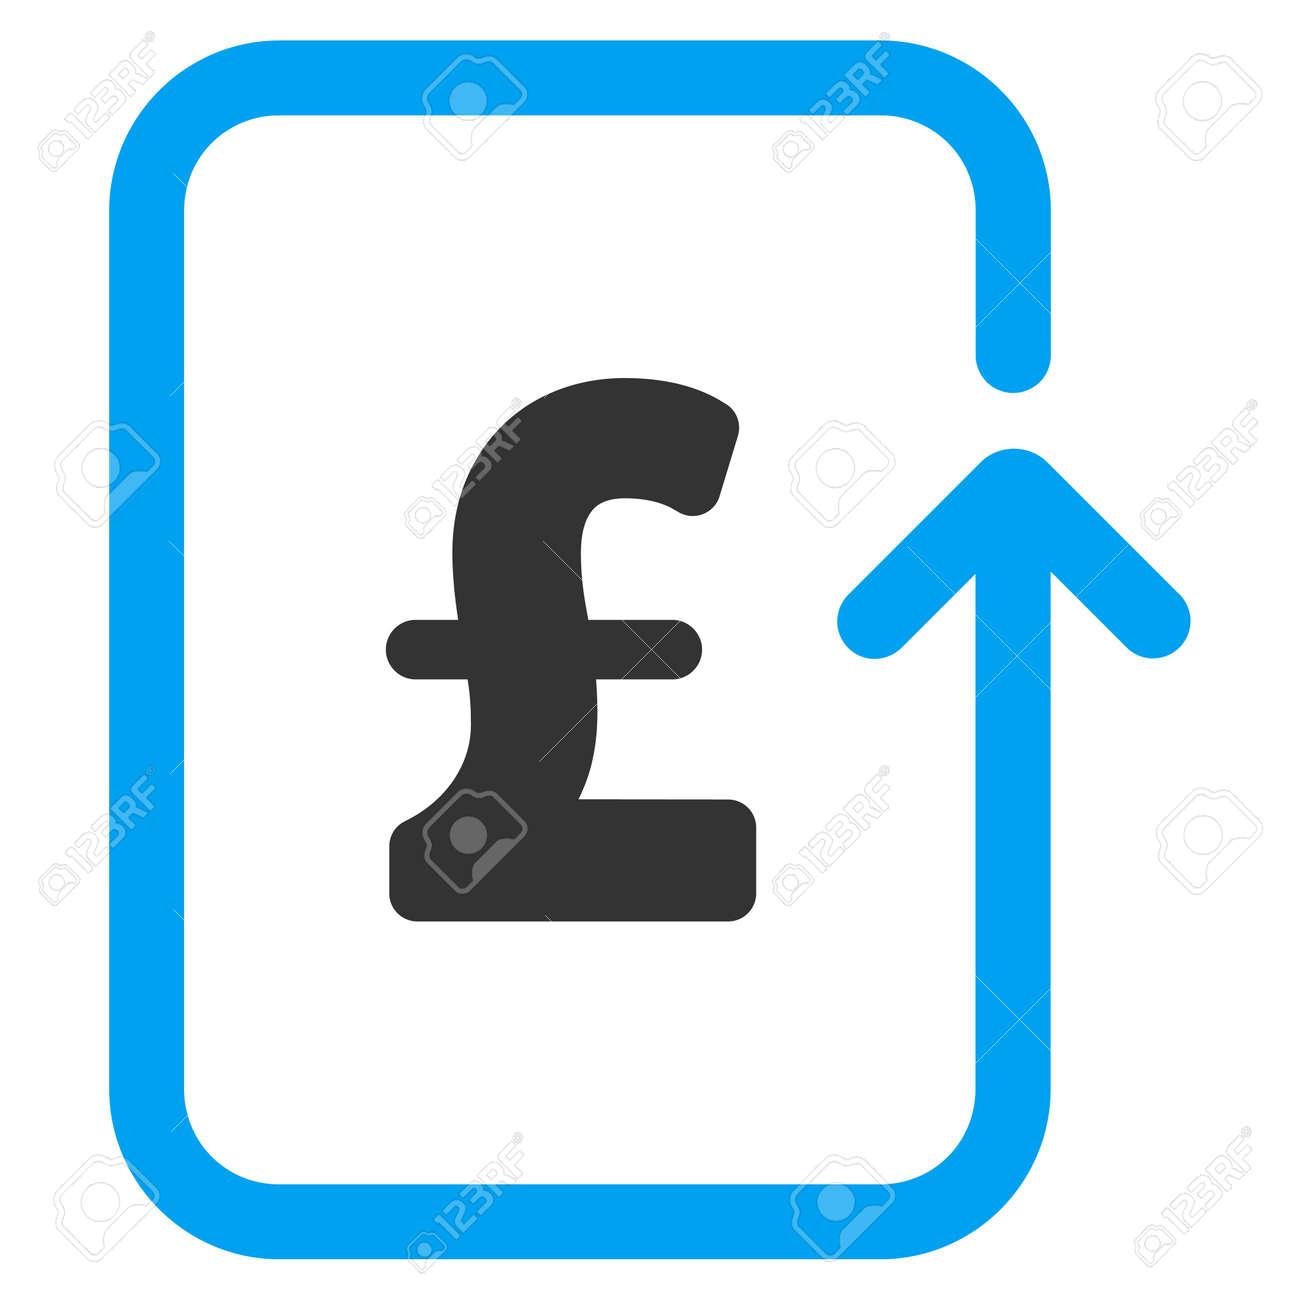 Inverse Pound Transaction Vector Icon Livre Inverse Transaction Icone Symbole Inverse Image Pound Transaction Icone Inverse Pound Transaction Icone